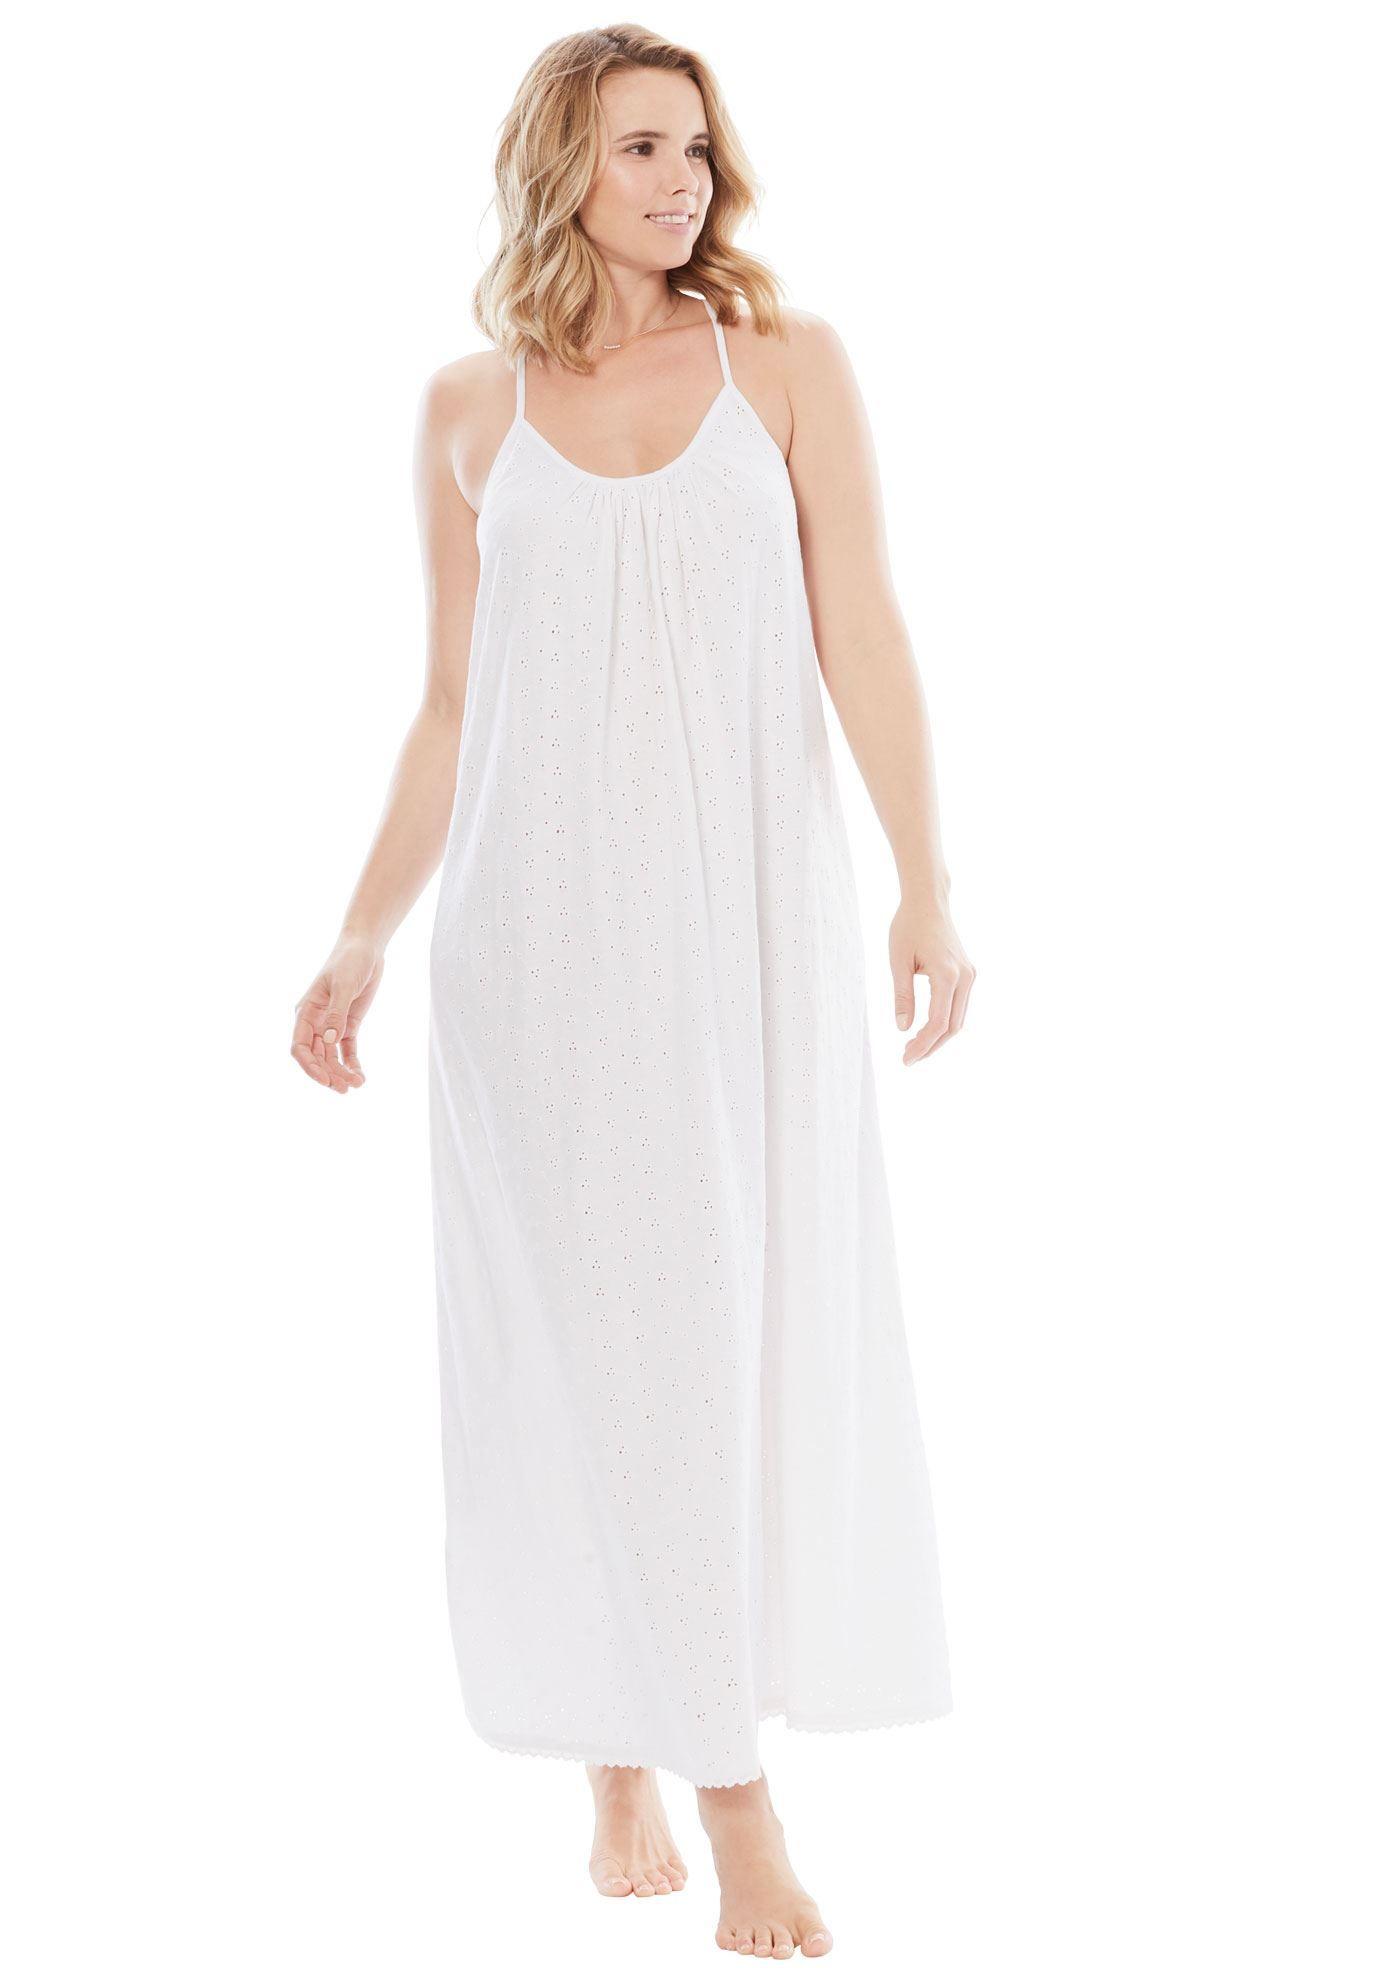 ec41a29a1559c Breezy Eyelet Knit Long Nightgown by Dreams & Co. - Women's Plus Size  Clothing